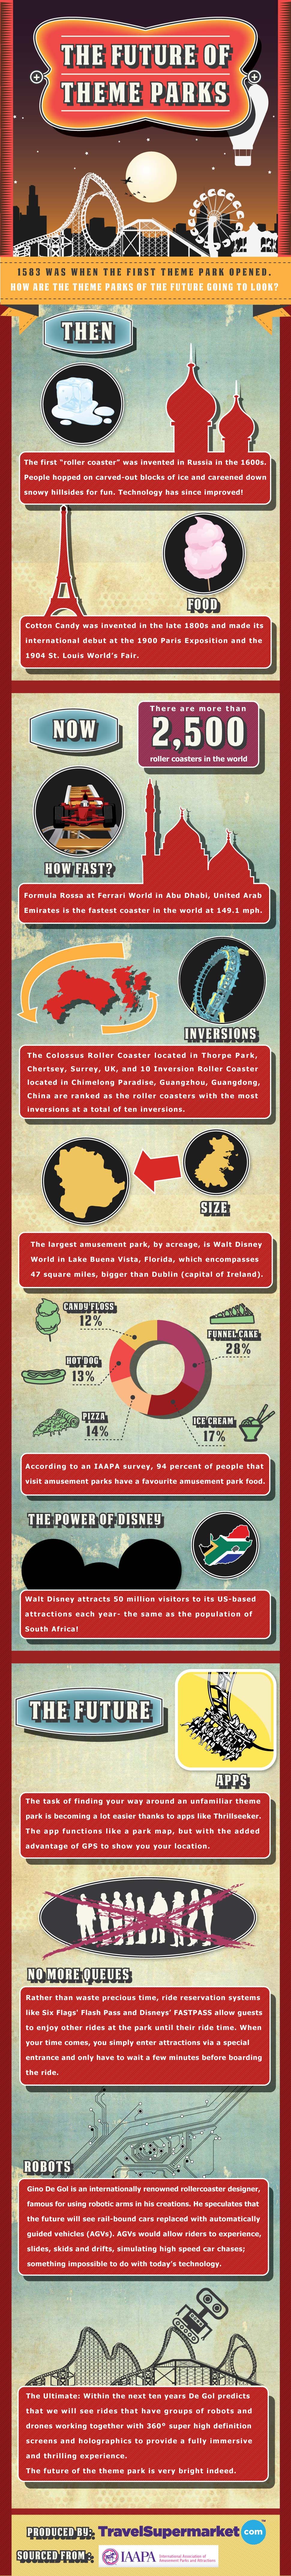 Amusement and Theme Parks Market Trends